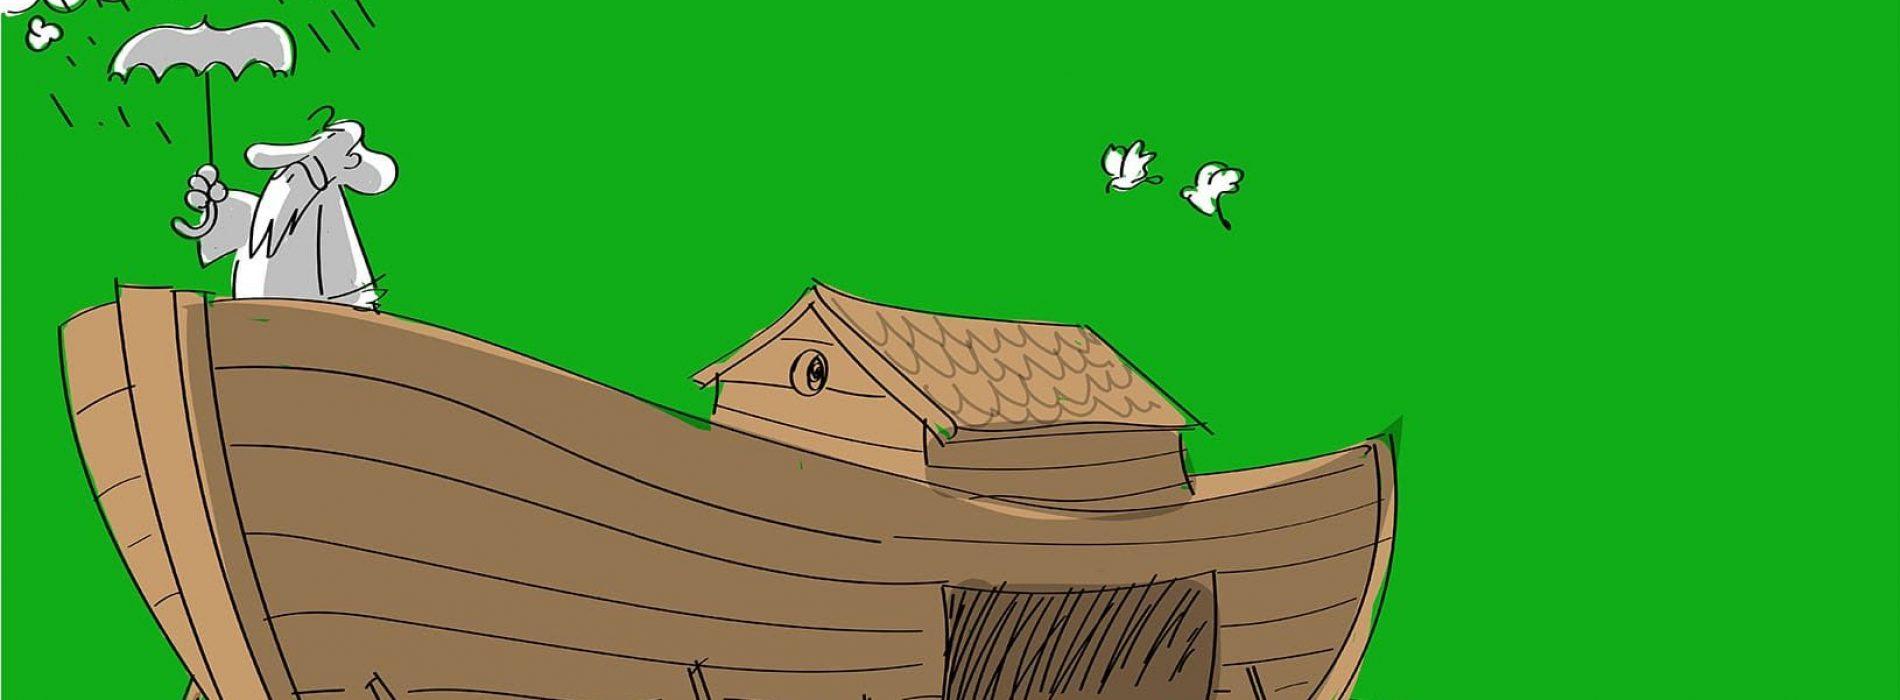 L'Arca di Noè, un'opera di Covino all'Ospedale di Caserta